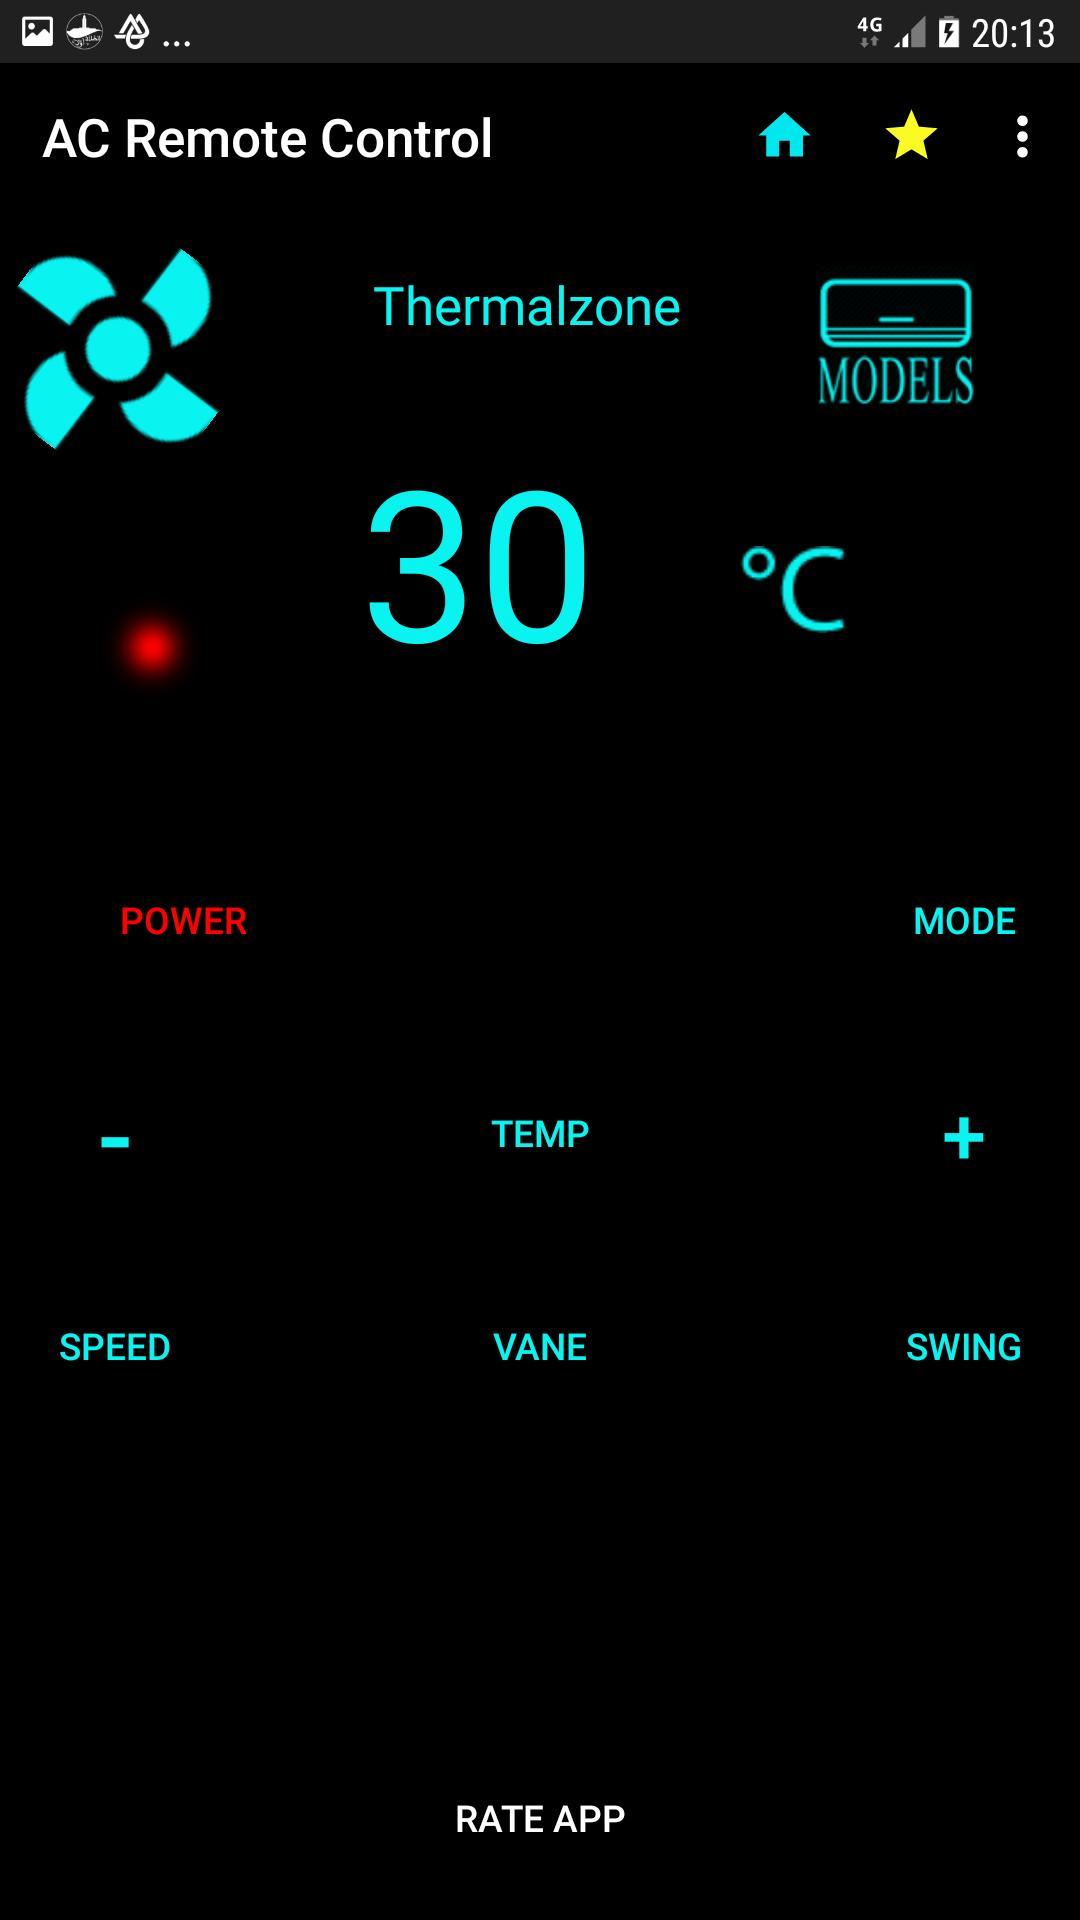 AC Remote Control Universal cho Android - Tải về APK